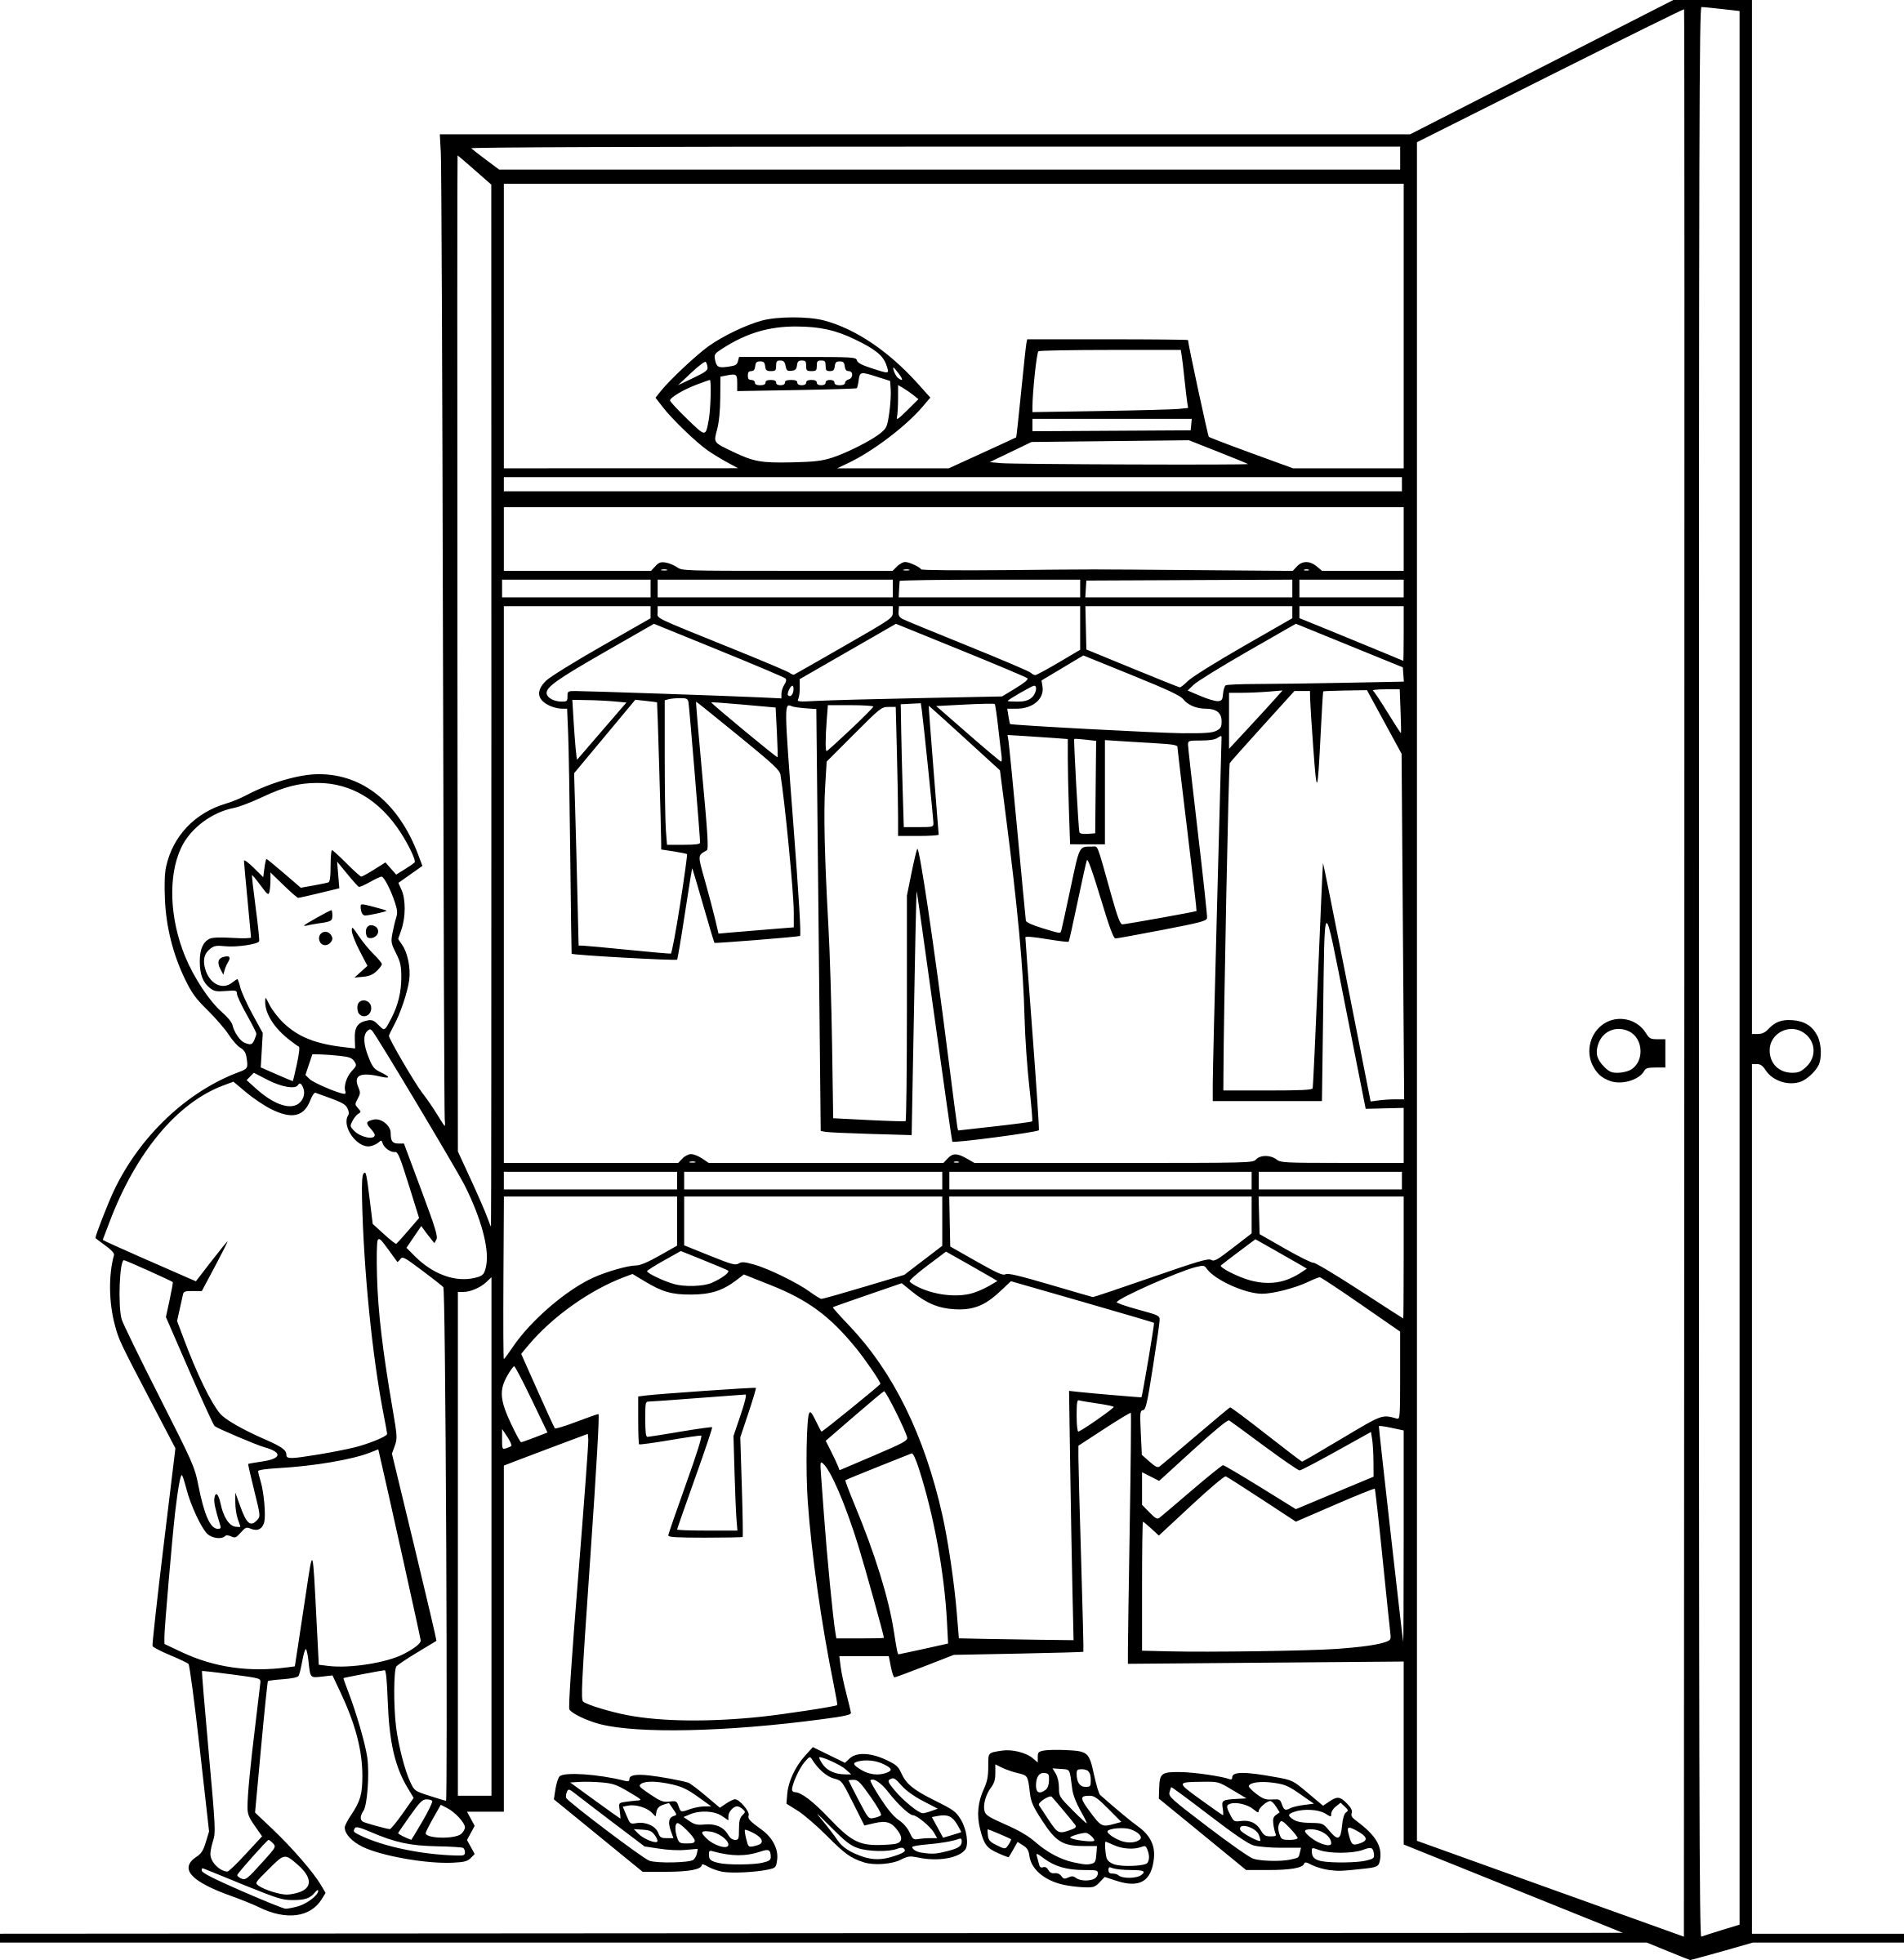 Wardrobe clipart black and white tentfox